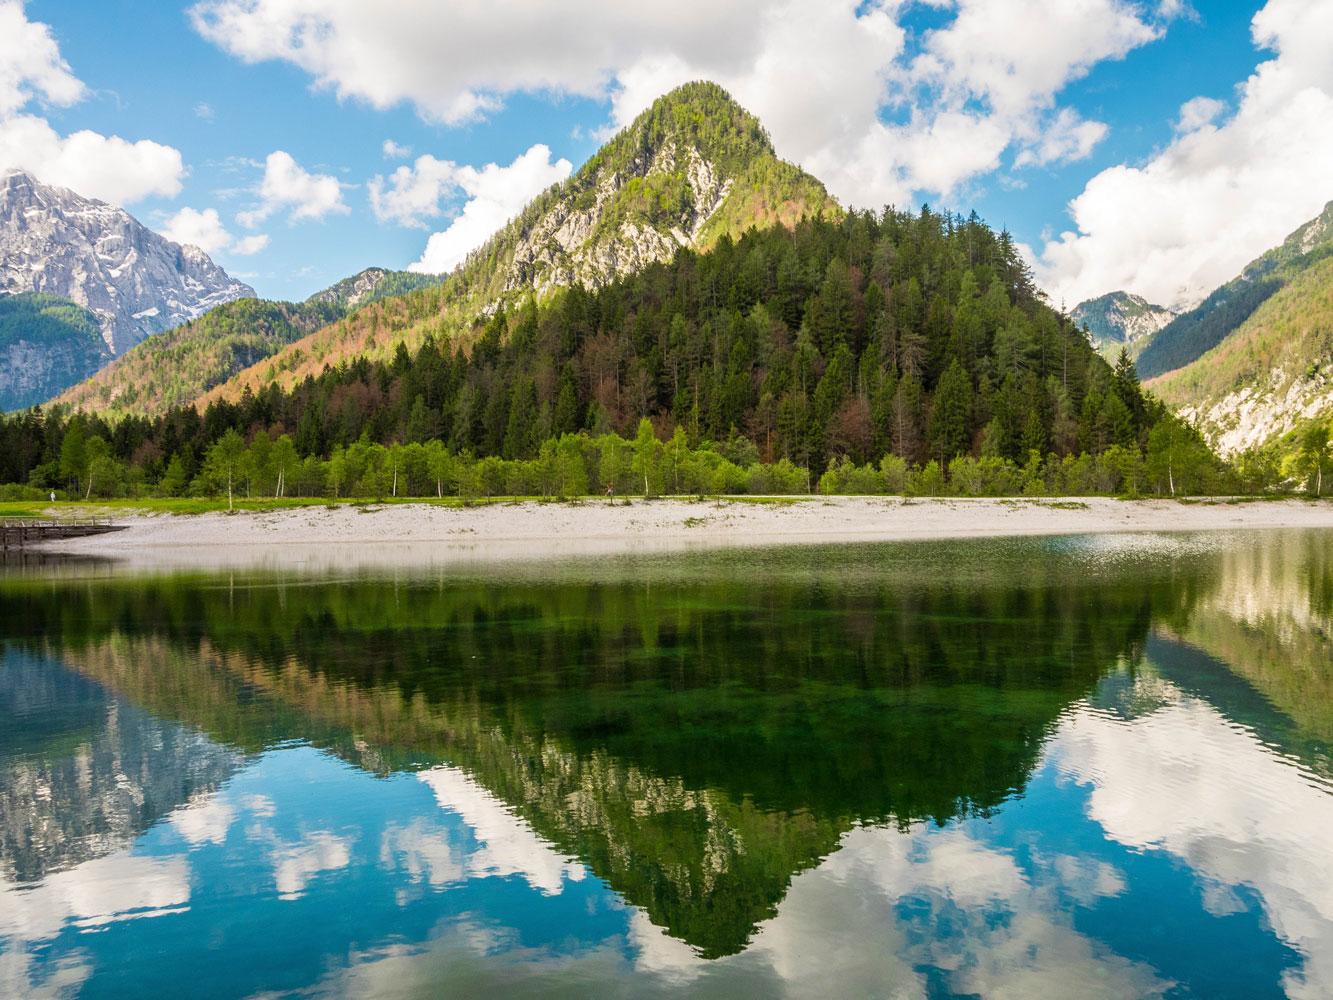 meer-van-bled-slovenie--berghaus-christel